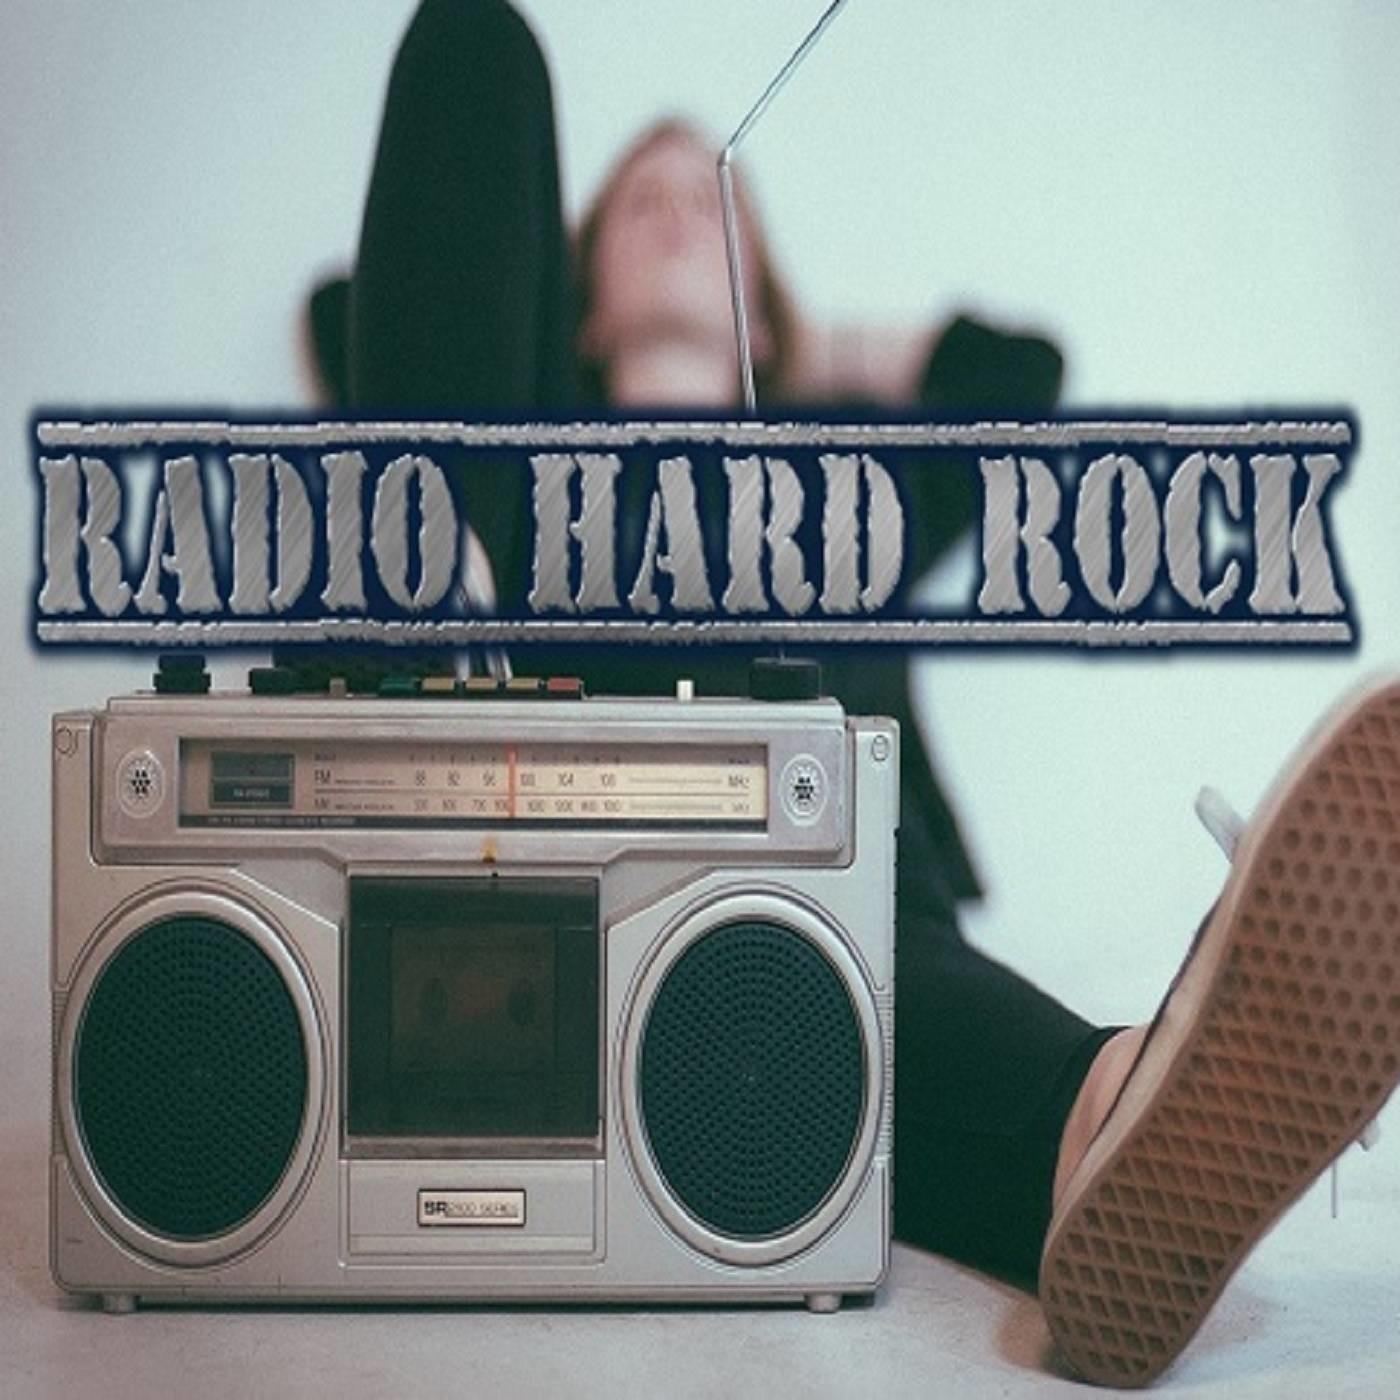 Radio Hard Rock podcast